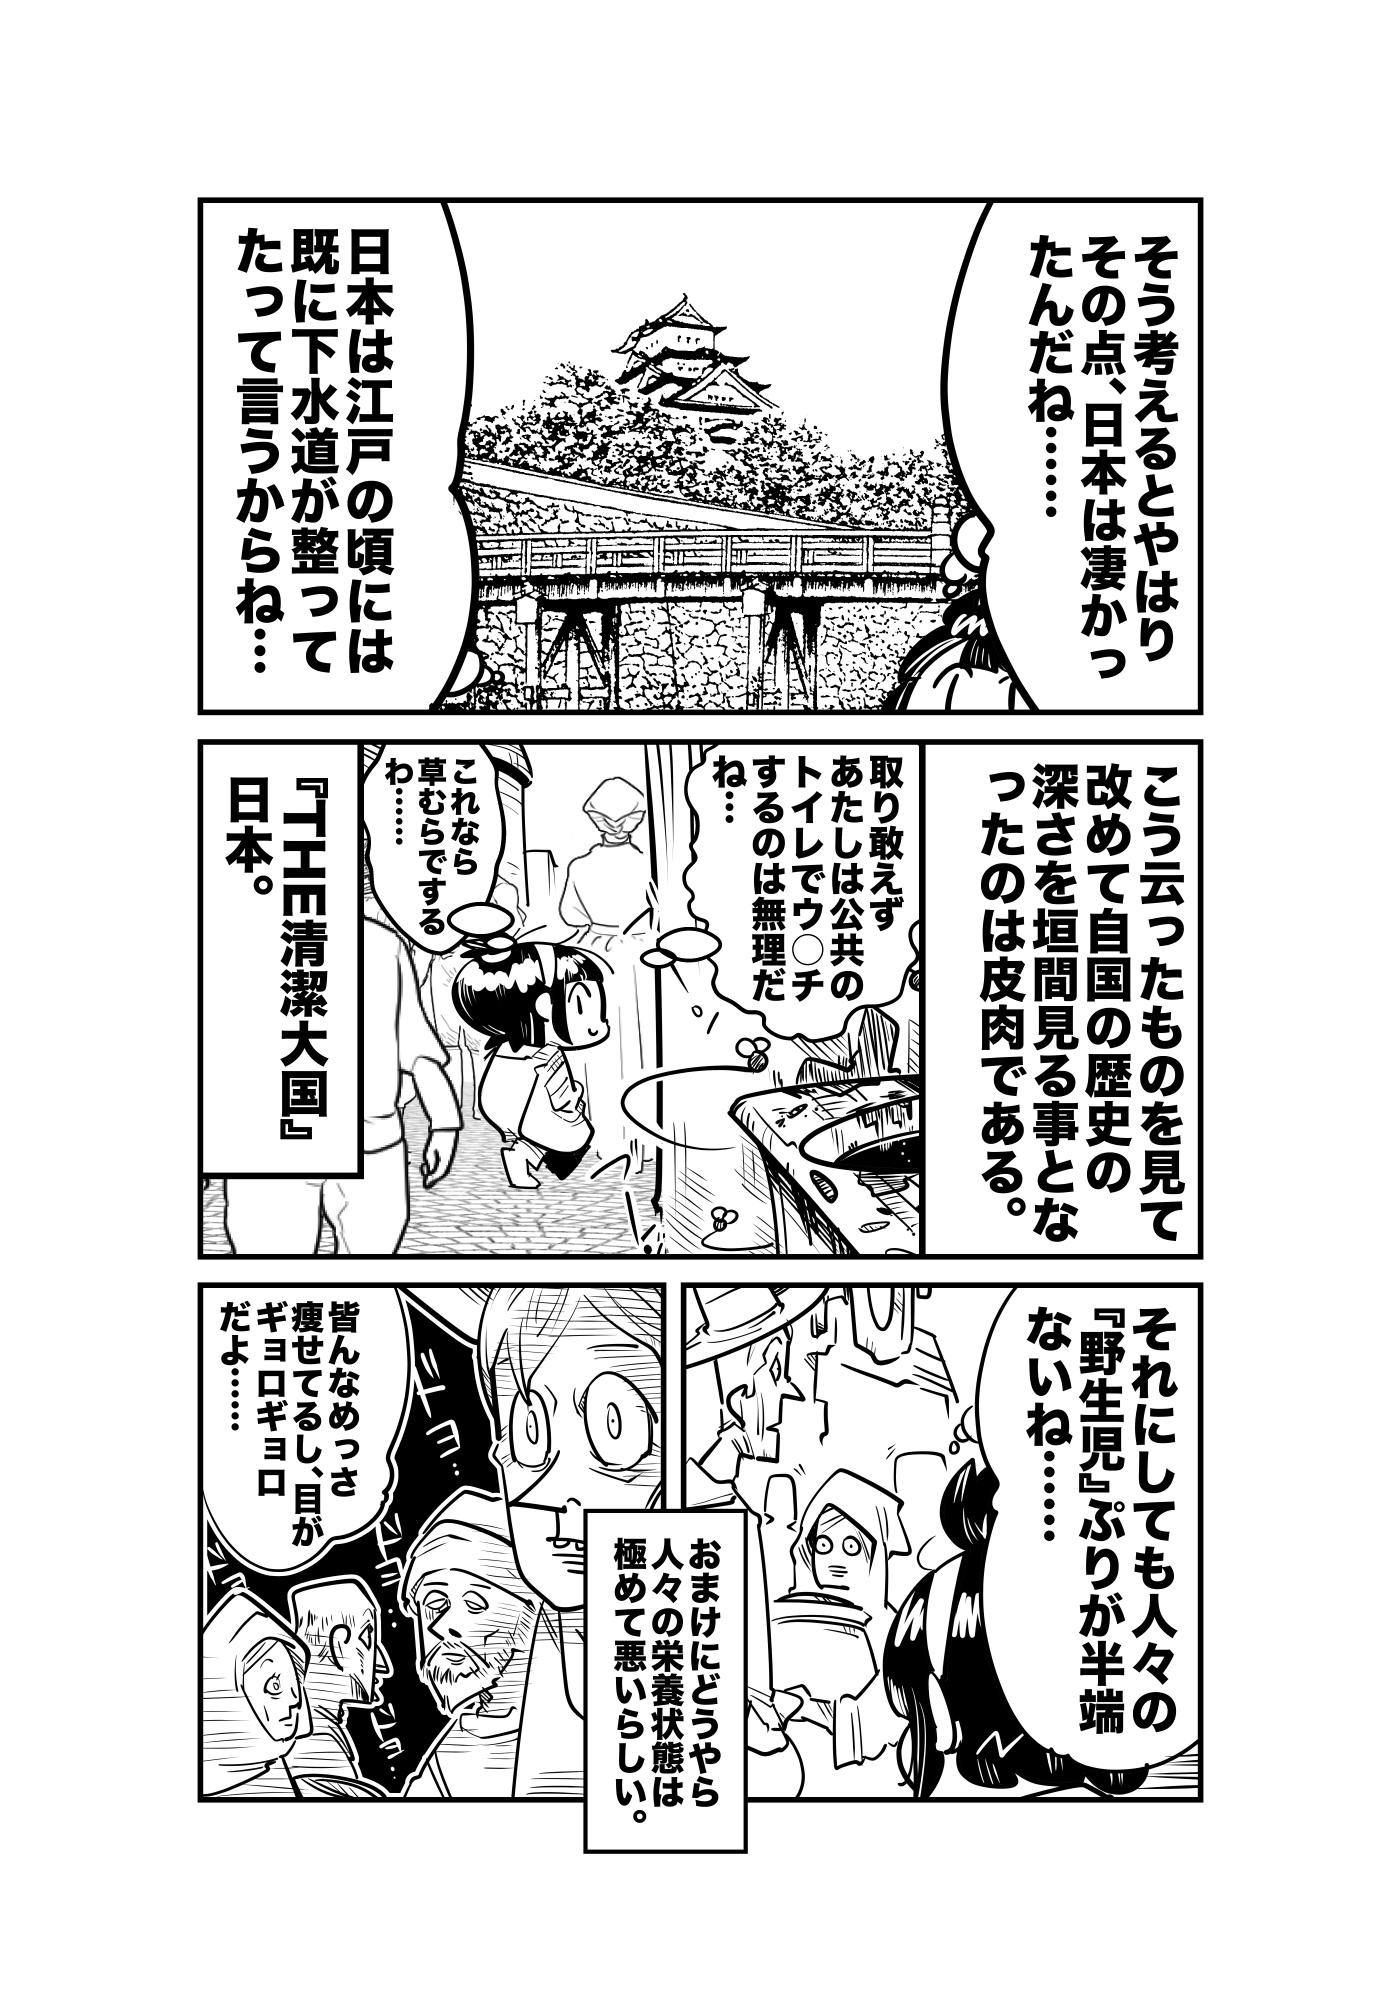 f:id:terashimaru117:20210910130940p:plain